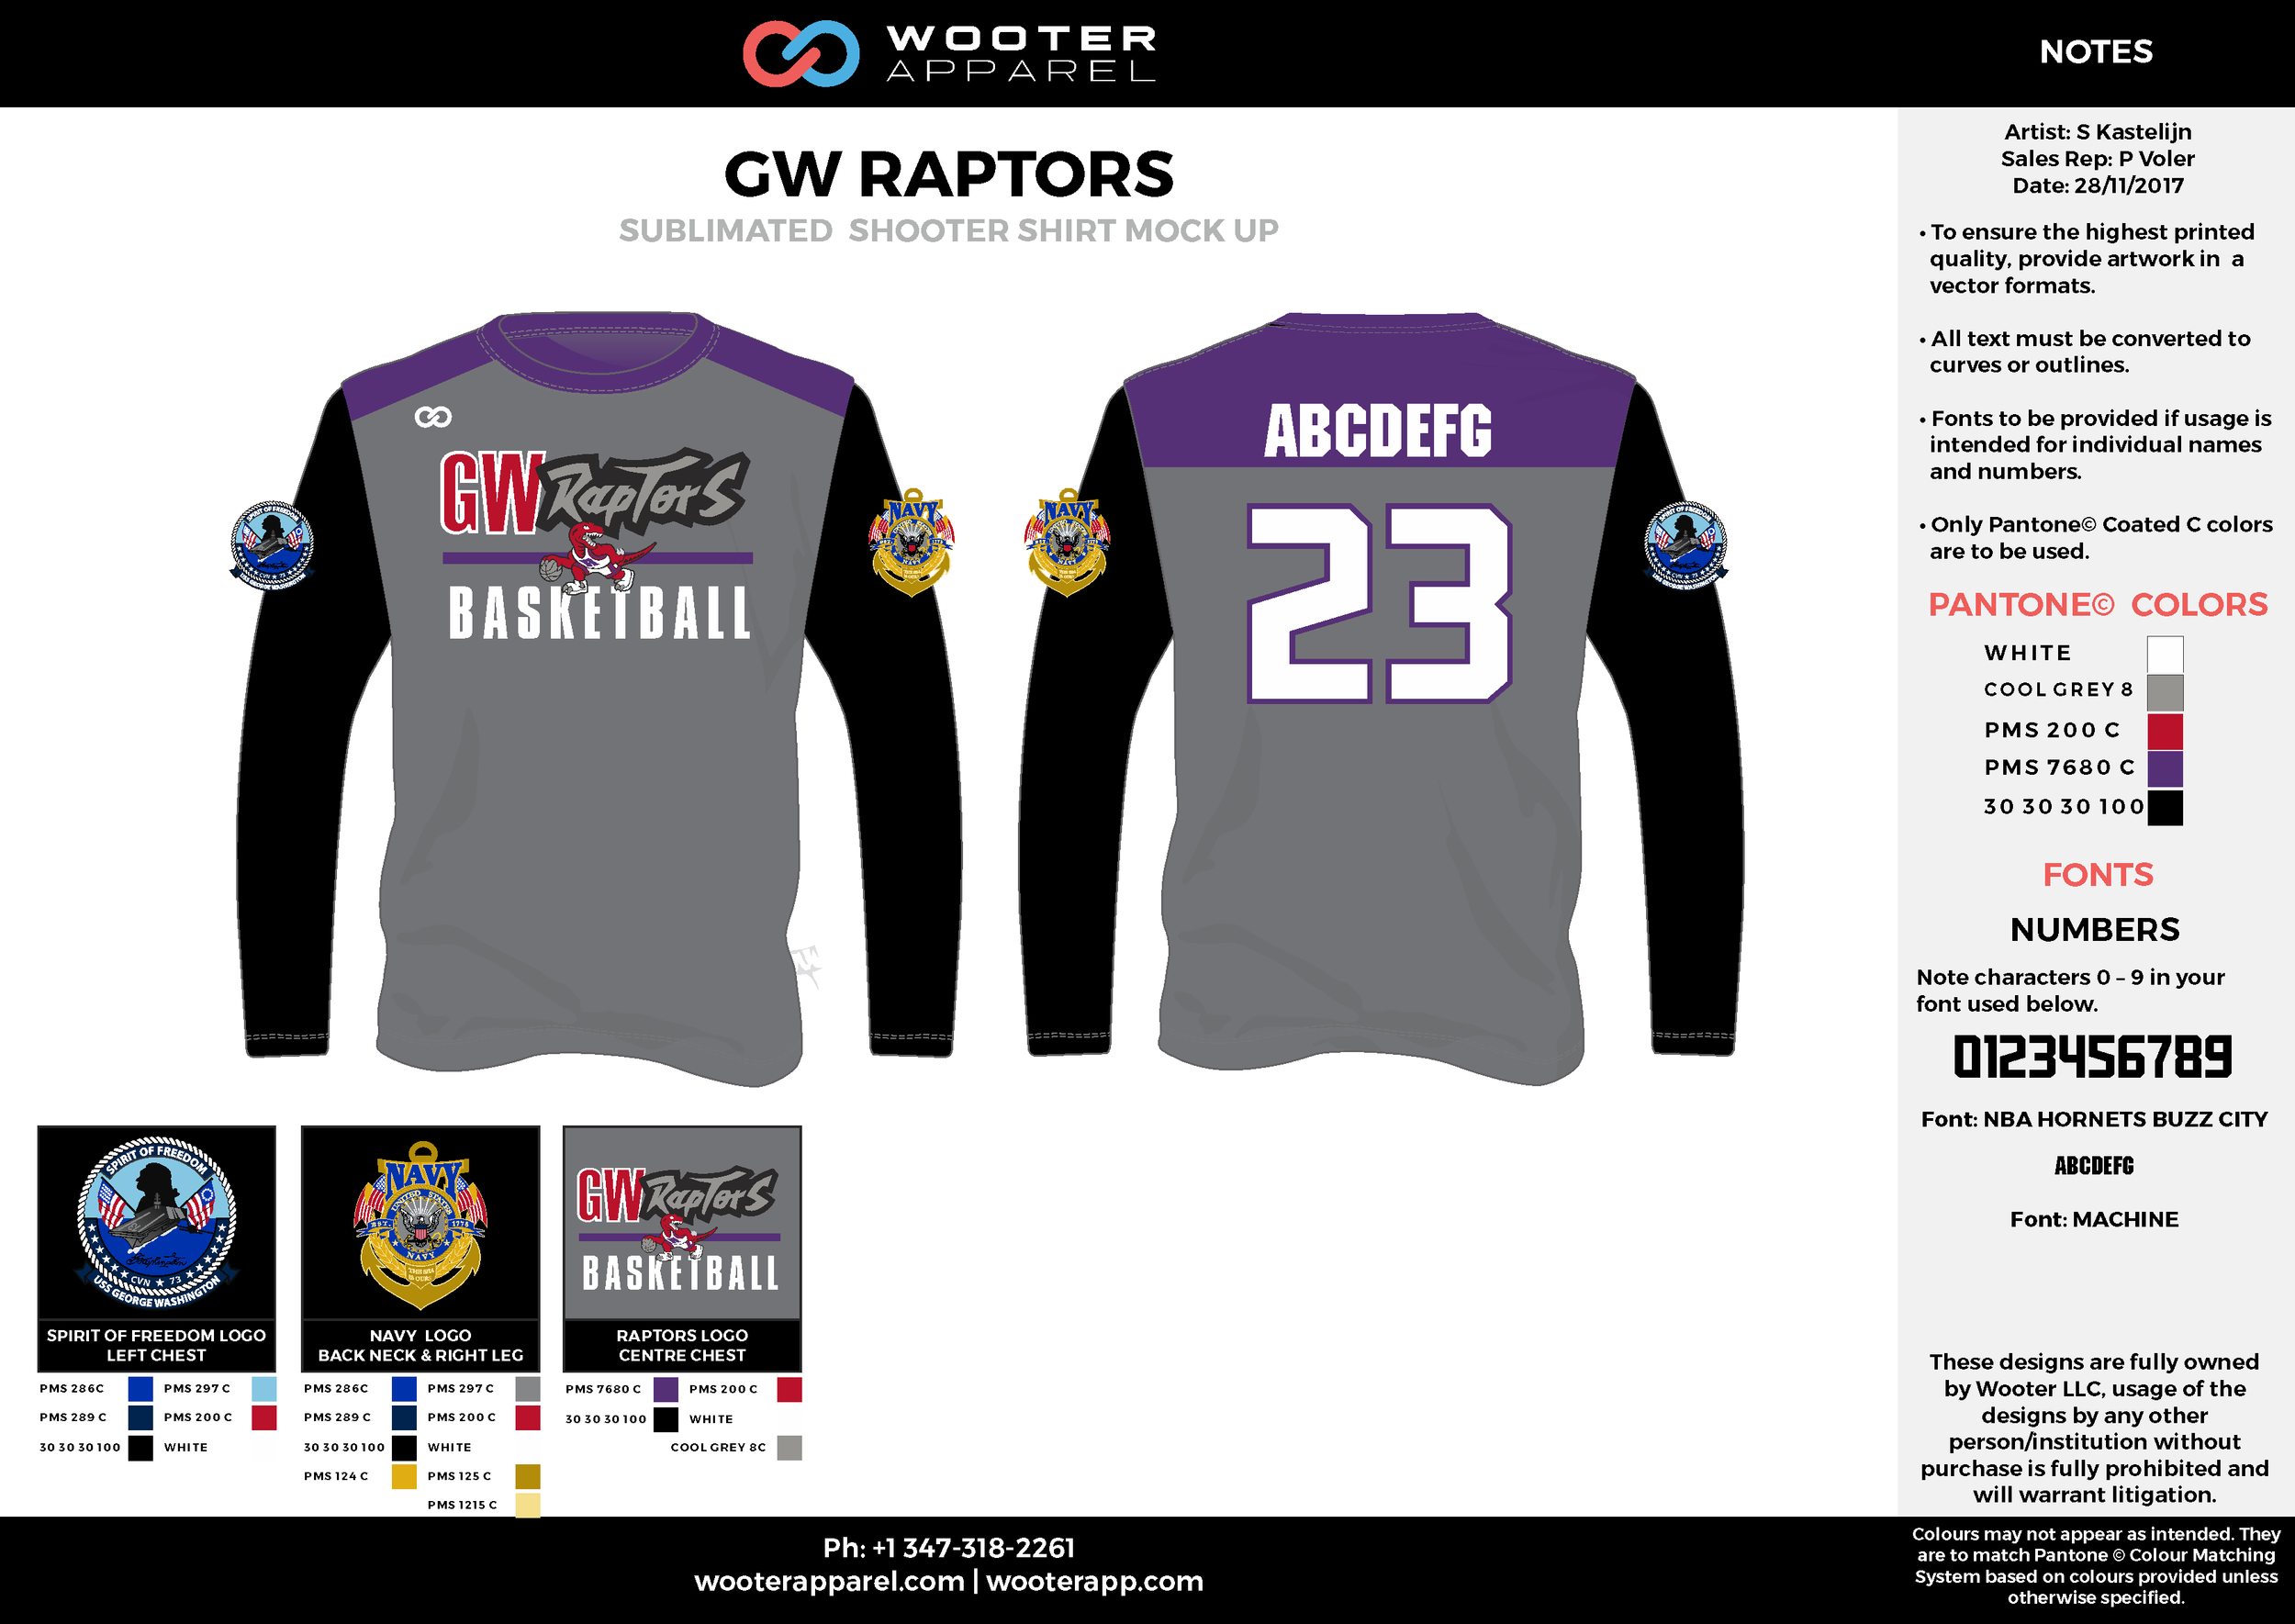 GW RAPTORS black purple red gray Basketball Long Sleeve Shooting Shirt